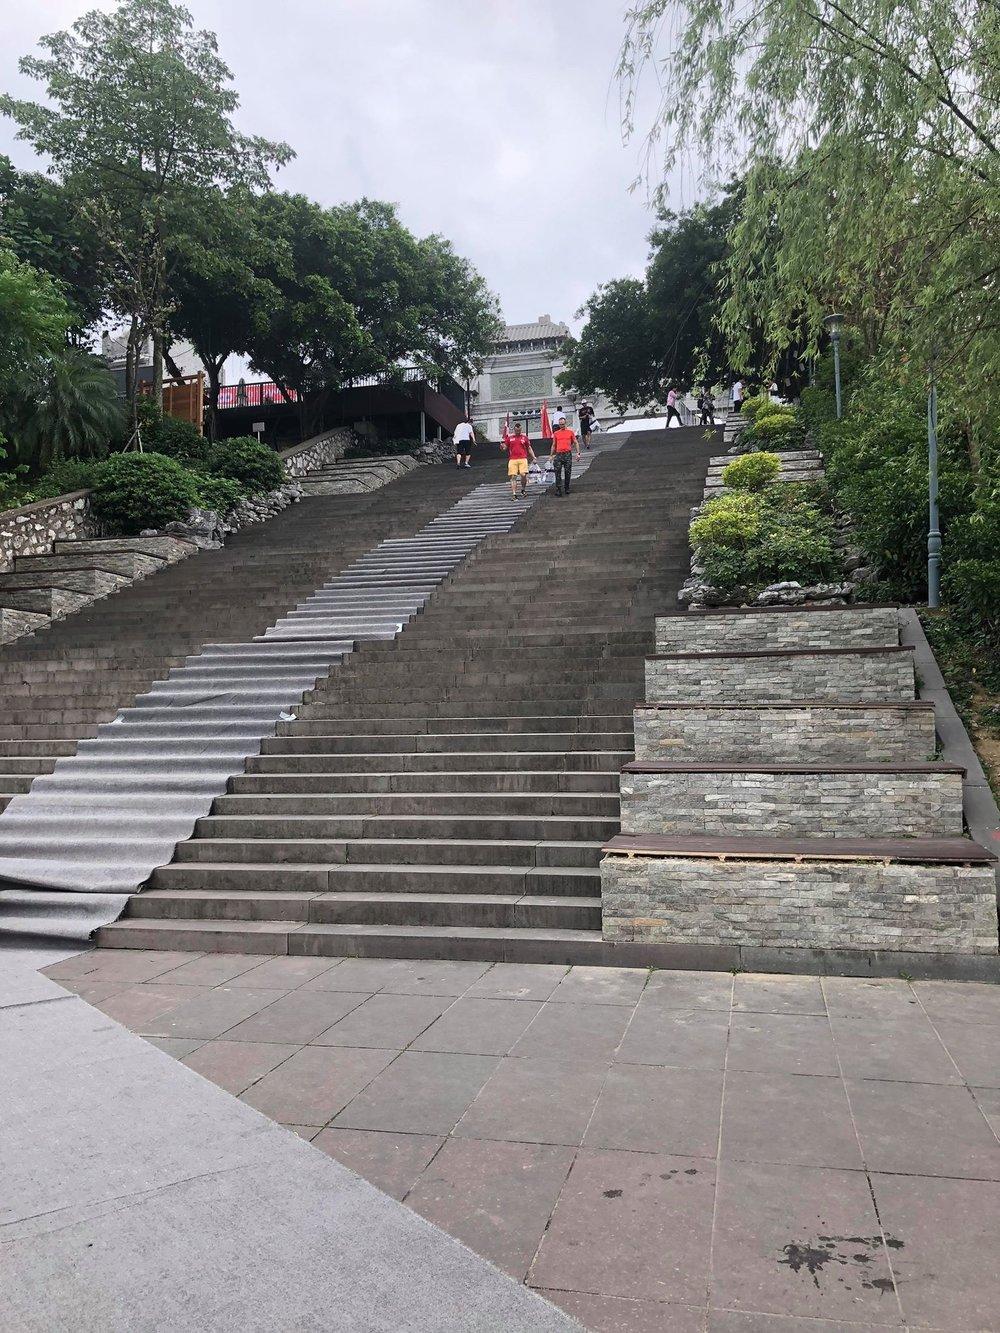 Coach_Terry_Wilson_Shannon_Florea_Rasco_Ironman_70.3_lihzou_Swim_Up_Stairs.jpg